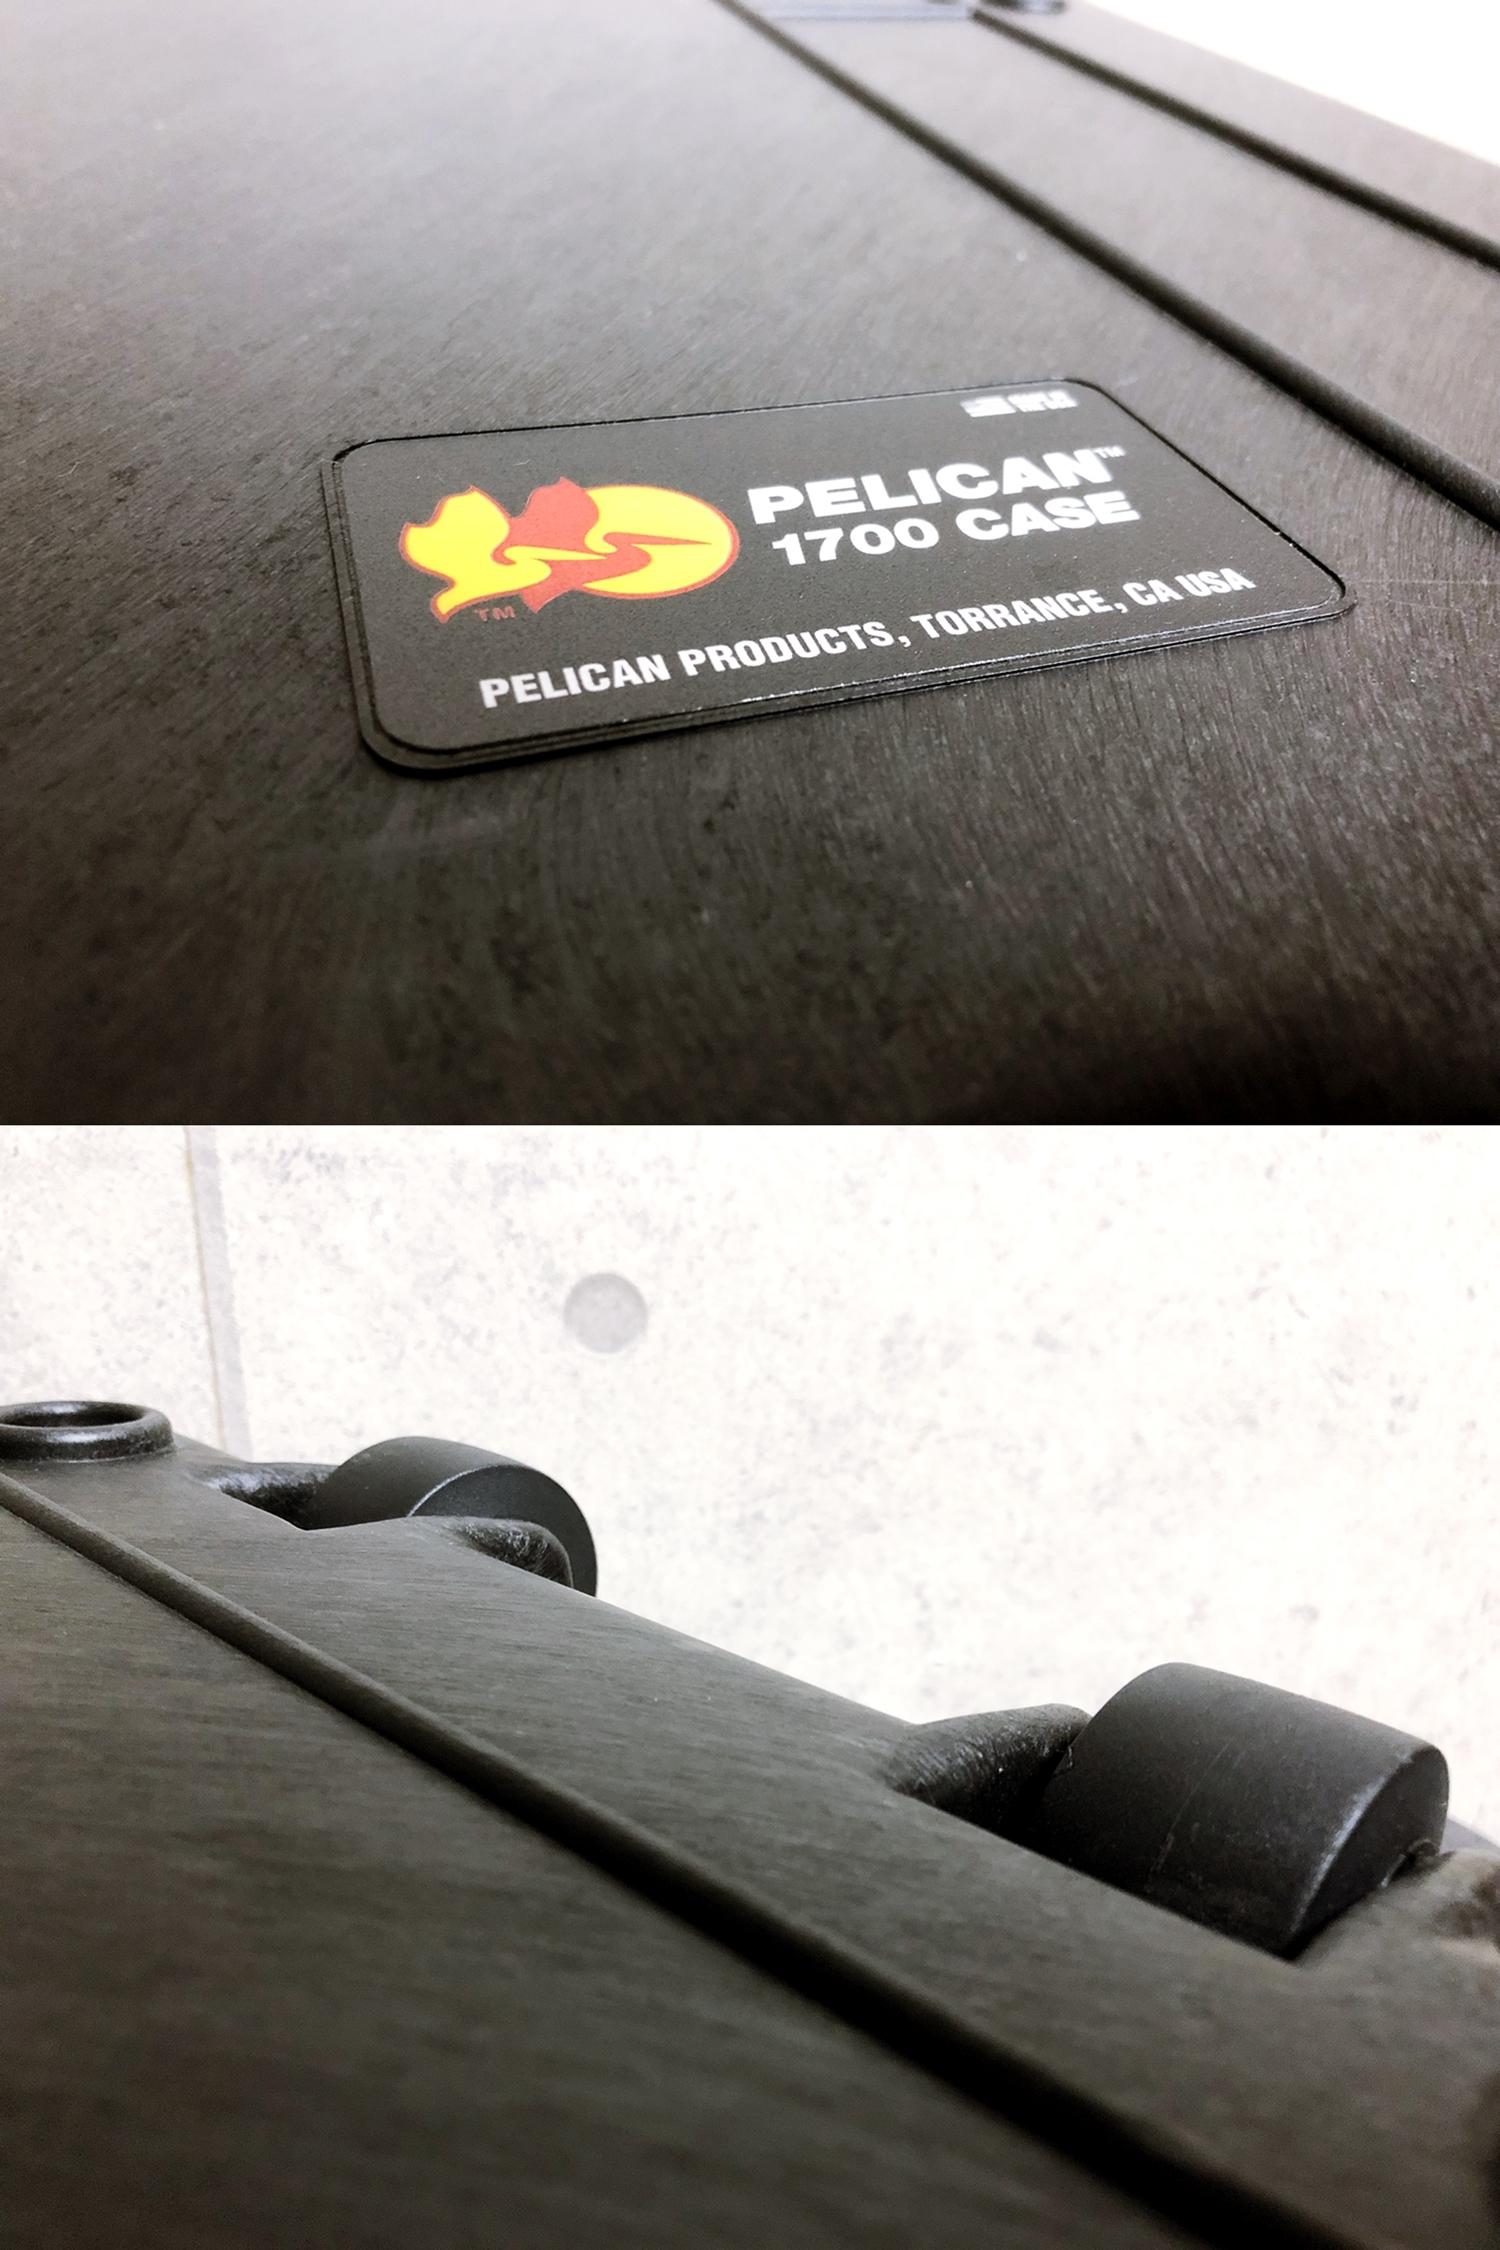 8 PELICAN 1700 PROTECTOR LONG CASE GET!! スポンジカスタム 収納計画!! ペリカン ハードケース ガンケース 購入 開封 レビュー!!